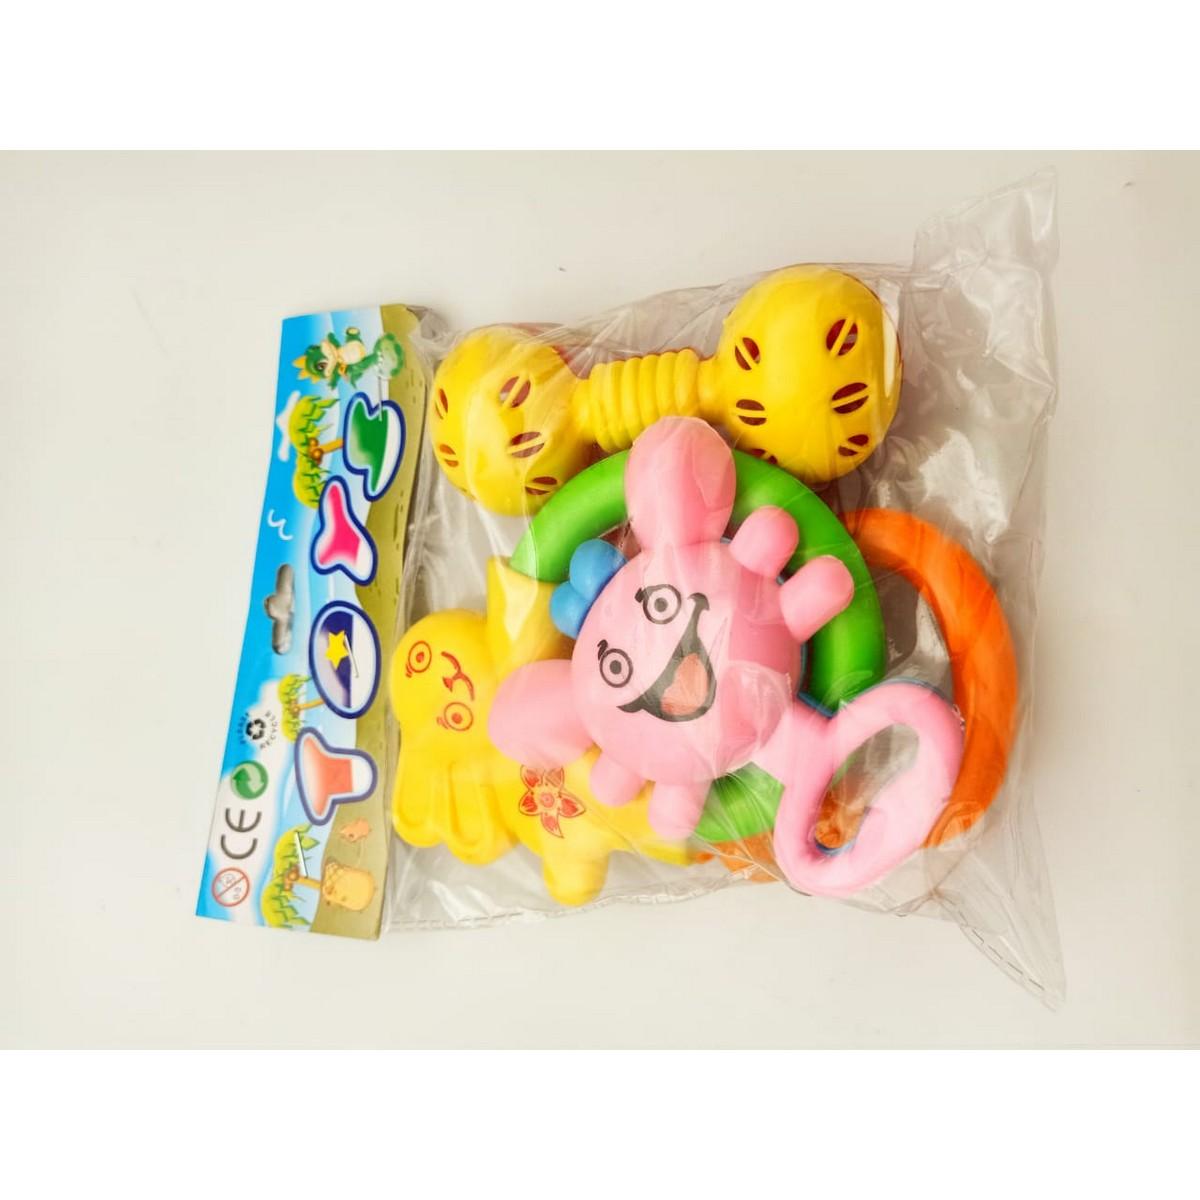 Baby Rattle Toys For New Born Baby Chunchuna